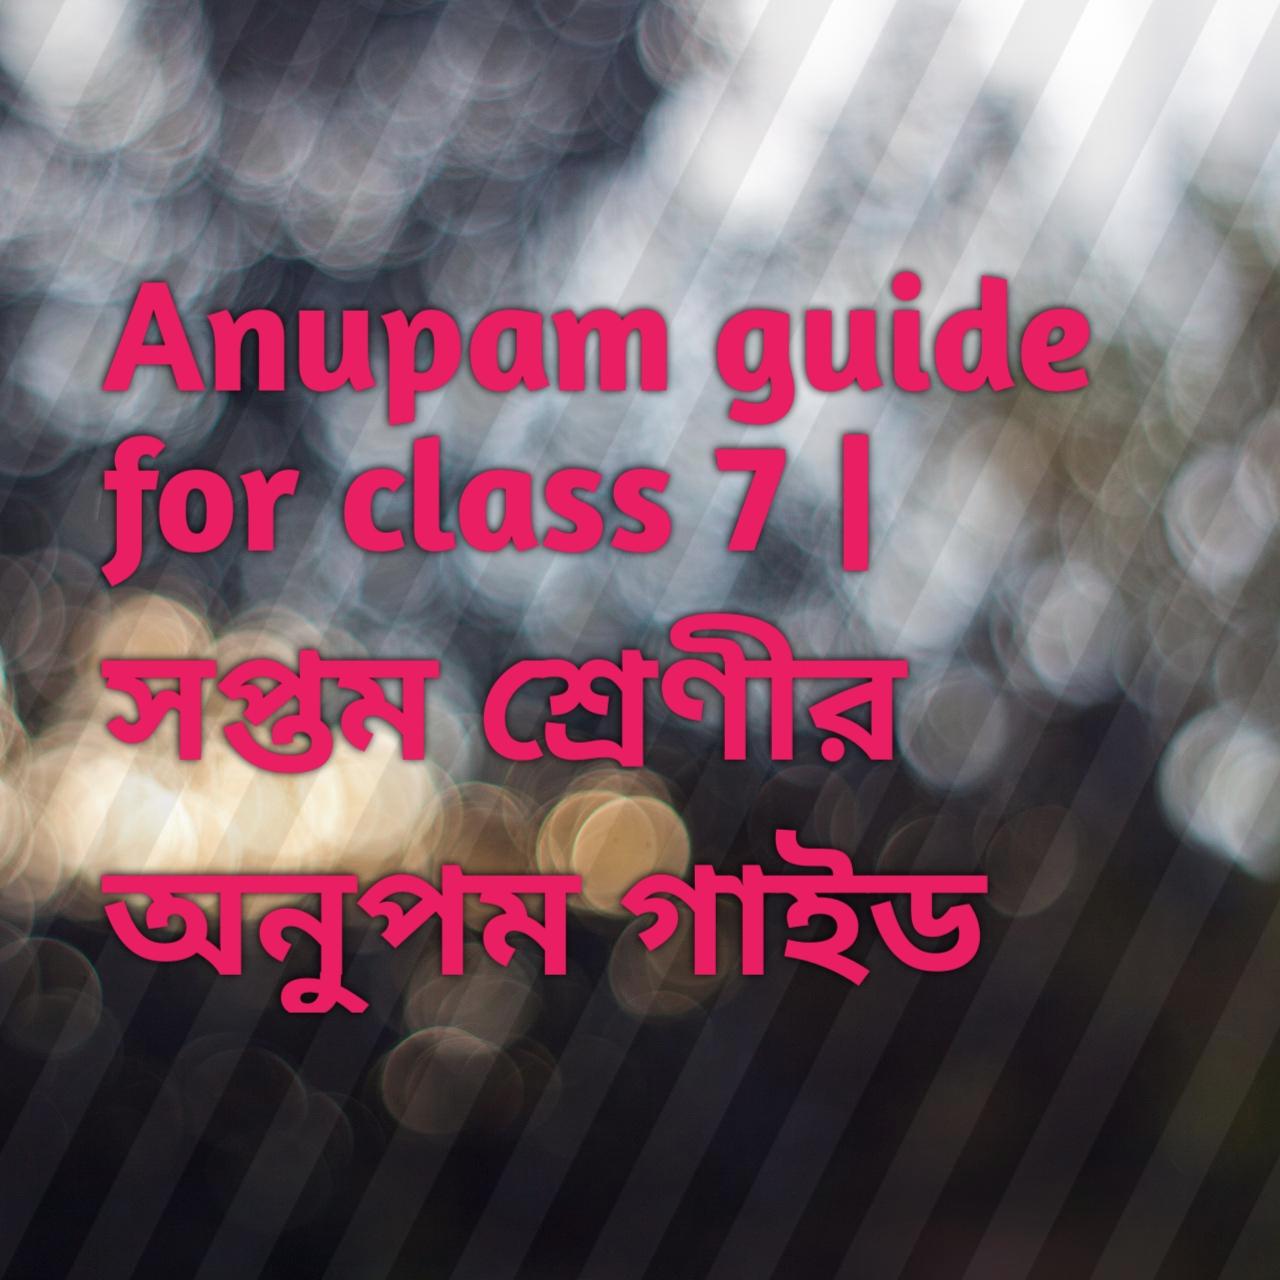 class 7 anupam guide 2021, class 7 anupam guide pdf, class 7 anupam guide book 2021, class 7 math solution anupam guide, anupam guide class 7, anupam guide for class 7, anupam guide for class 7 english, anupam guide for class 7 math, anupam guide for class 7 science, anupam guide for class 7 Bangladesh and global studies, anupam guide for class 7, anupam guide for class 7 hindu dharma, anupam guide for class 7 ICT, anupam guide for class 7 home science, anupam guide for class 7 agriculture education, anupam guide for class physical education, সপ্তম শ্রেণীর বাংলা গাইড অনুপম ডাউনলোড, সপ্তম শ্রেণীর বাংলা গাইড এর পিডিএফ, সপ্তম শ্রেণির বাংলা অনুপম গাইড পিডিএফ ২০২১, সপ্তম শ্রেণীর অনুপম গাইড ২০২১, সপ্তম শ্রেণির ইংরেজি অনুপম গাইড, সপ্তম শ্রেণীর গণিত অনুপম গাইড, সপ্তম শ্রেণীর অনুপম গাইড বিজ্ঞান, শ্রেণীর অনুপম গাইড বাংলাদেশ ও বিশ্বপরিচয়, সপ্তম শ্রেণীর অনুপম গাইড ইসলাম শিক্ষা, সপ্তম শ্রেণীর অনুপম গাইড হিন্দুধর্ম, সপ্তম শ্রেণীর অনুপম গাইড গার্হস্থ্য বিজ্ঞান, সপ্তম শ্রেণীর অনুপম গাইড কৃষি শিক্ষা, সপ্তম শ্রেণীর অনুপম গাইড তথ্য যোগাযোগ প্রযুক্তি, সপ্তম শ্রেণীর অনুপম গাইড শারীরিক শিক্ষা,